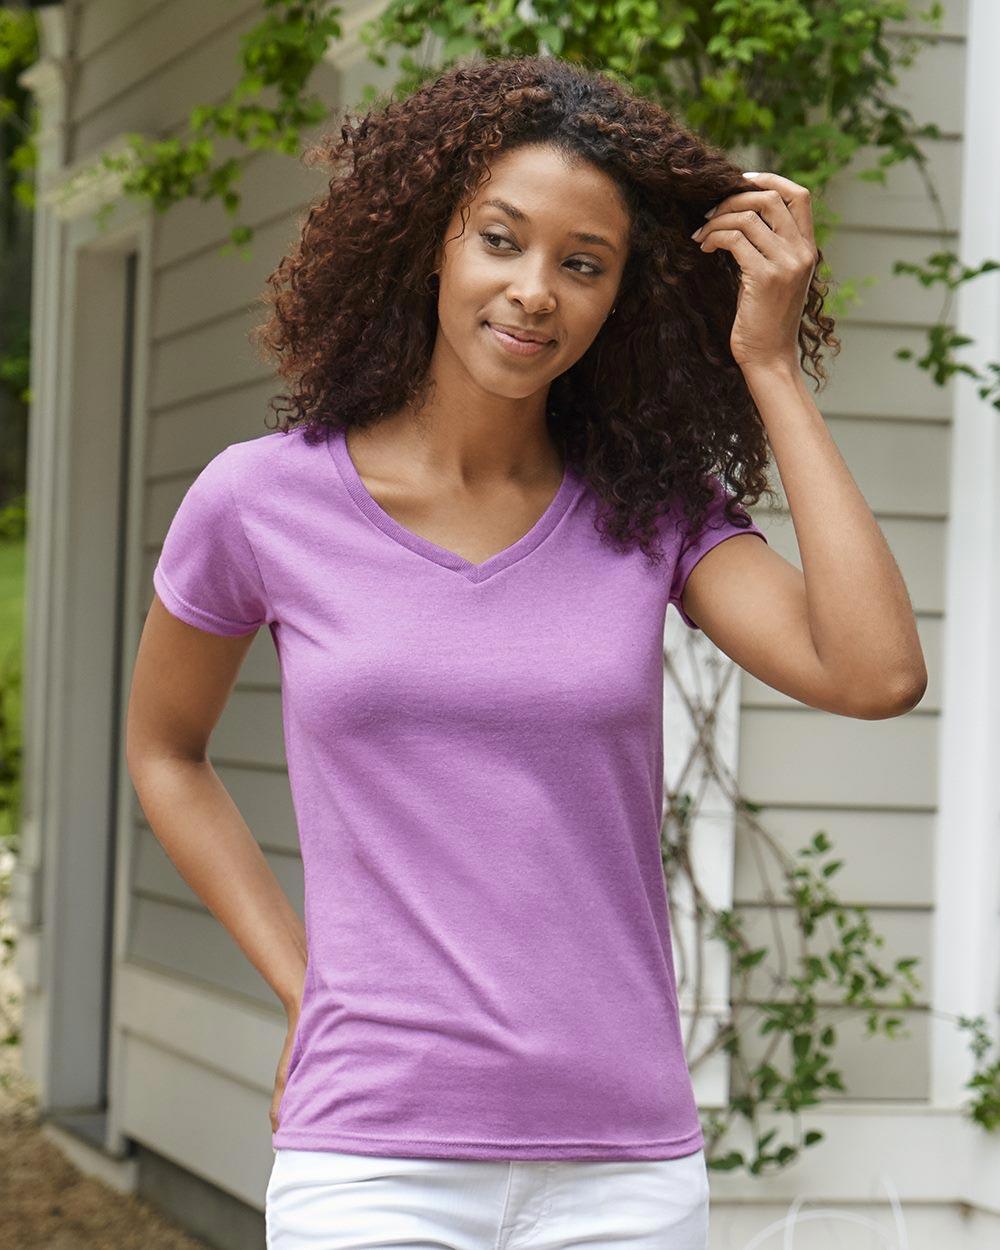 Gildan 5V00L - Heavy Cotton Women's V-Neck T-Shirt